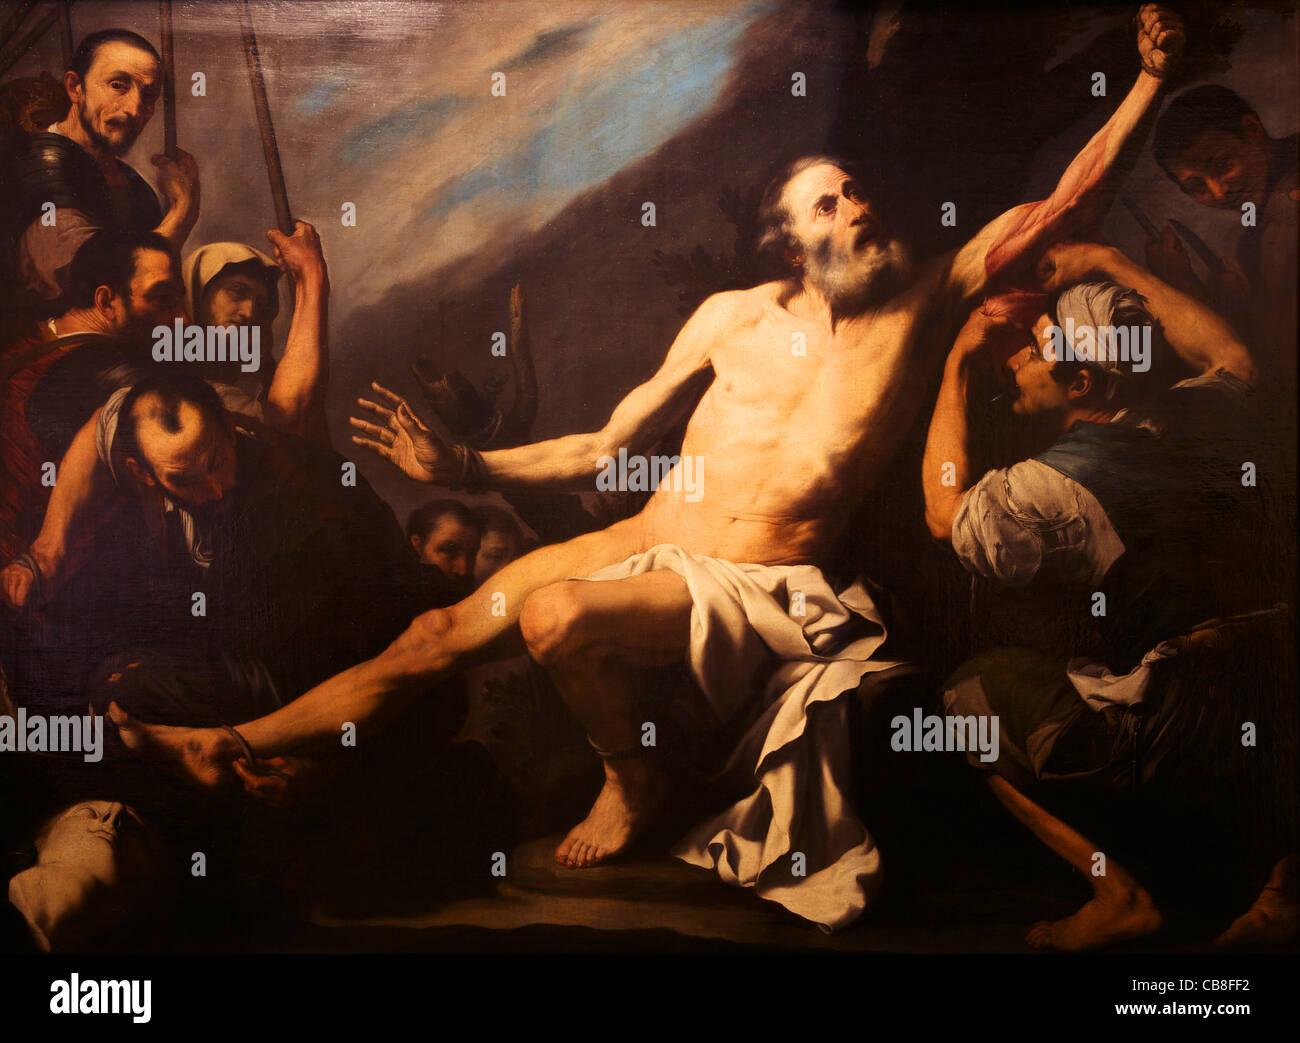 Martyrdom of Saint Bartholomew, by Jose de Ribera, Royal Academy of, San Fernando, Madrid, Spain, Europe, EU - Stock Image